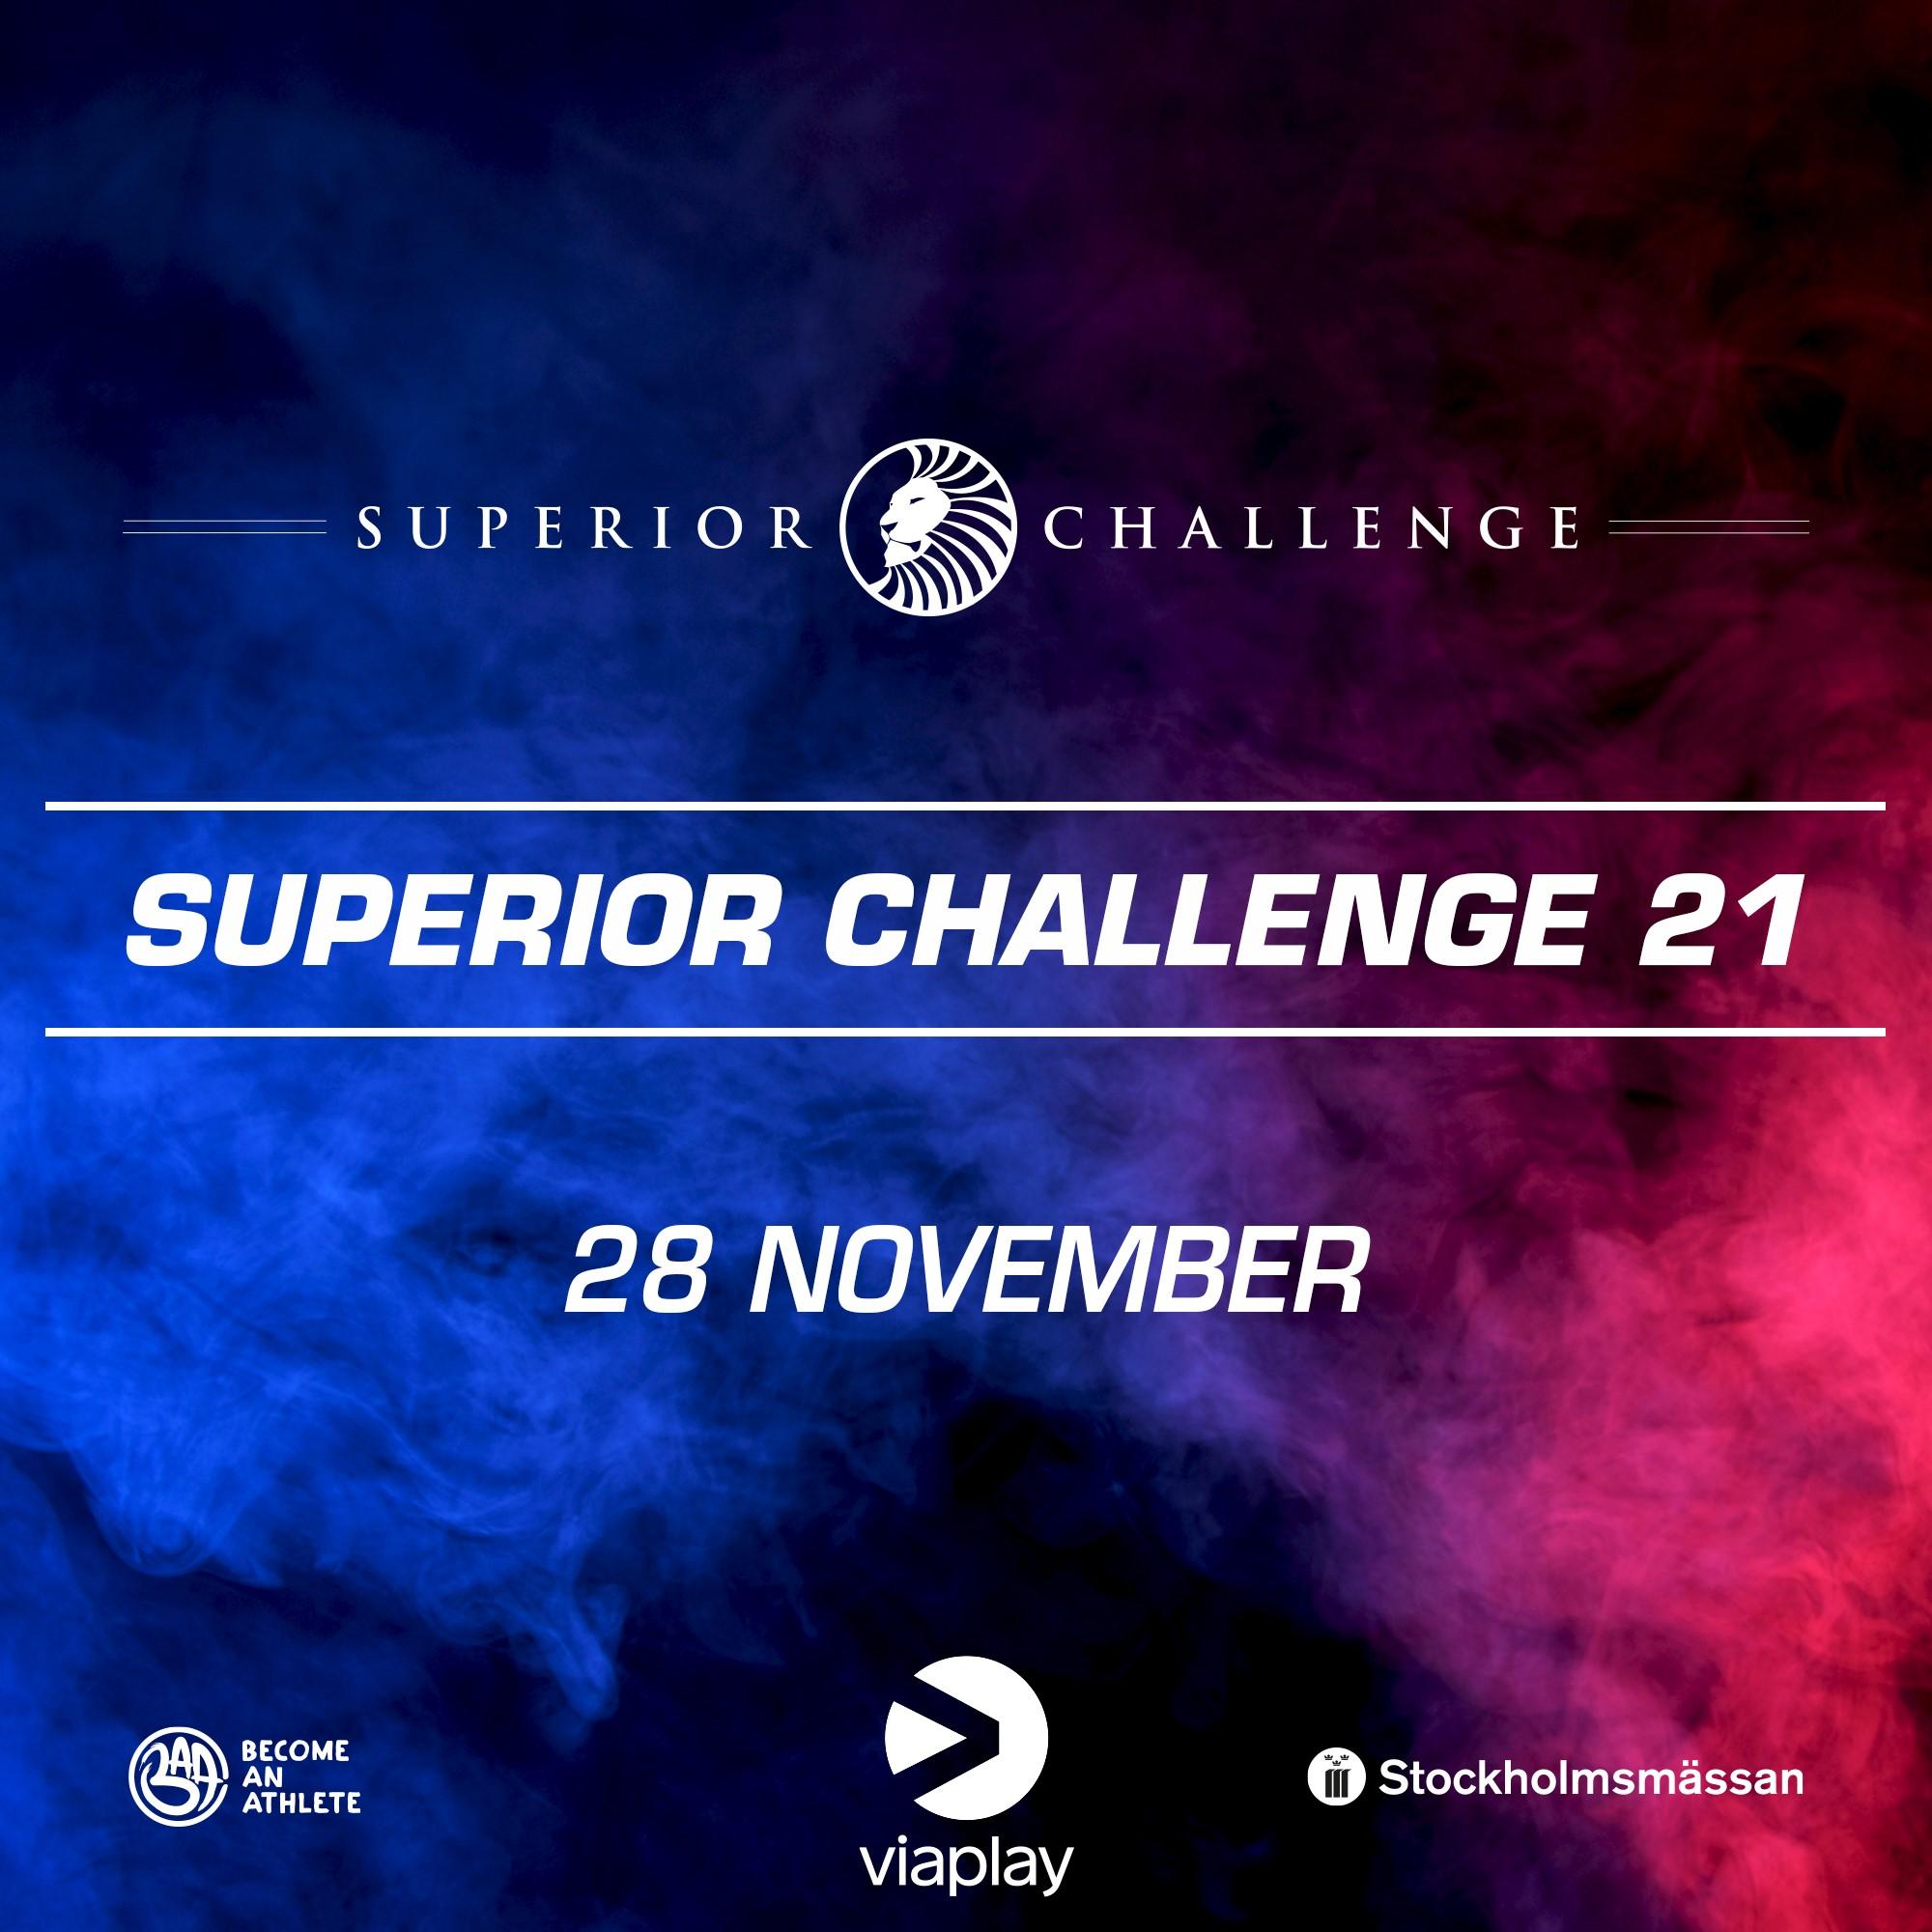 Superior Challenge 21